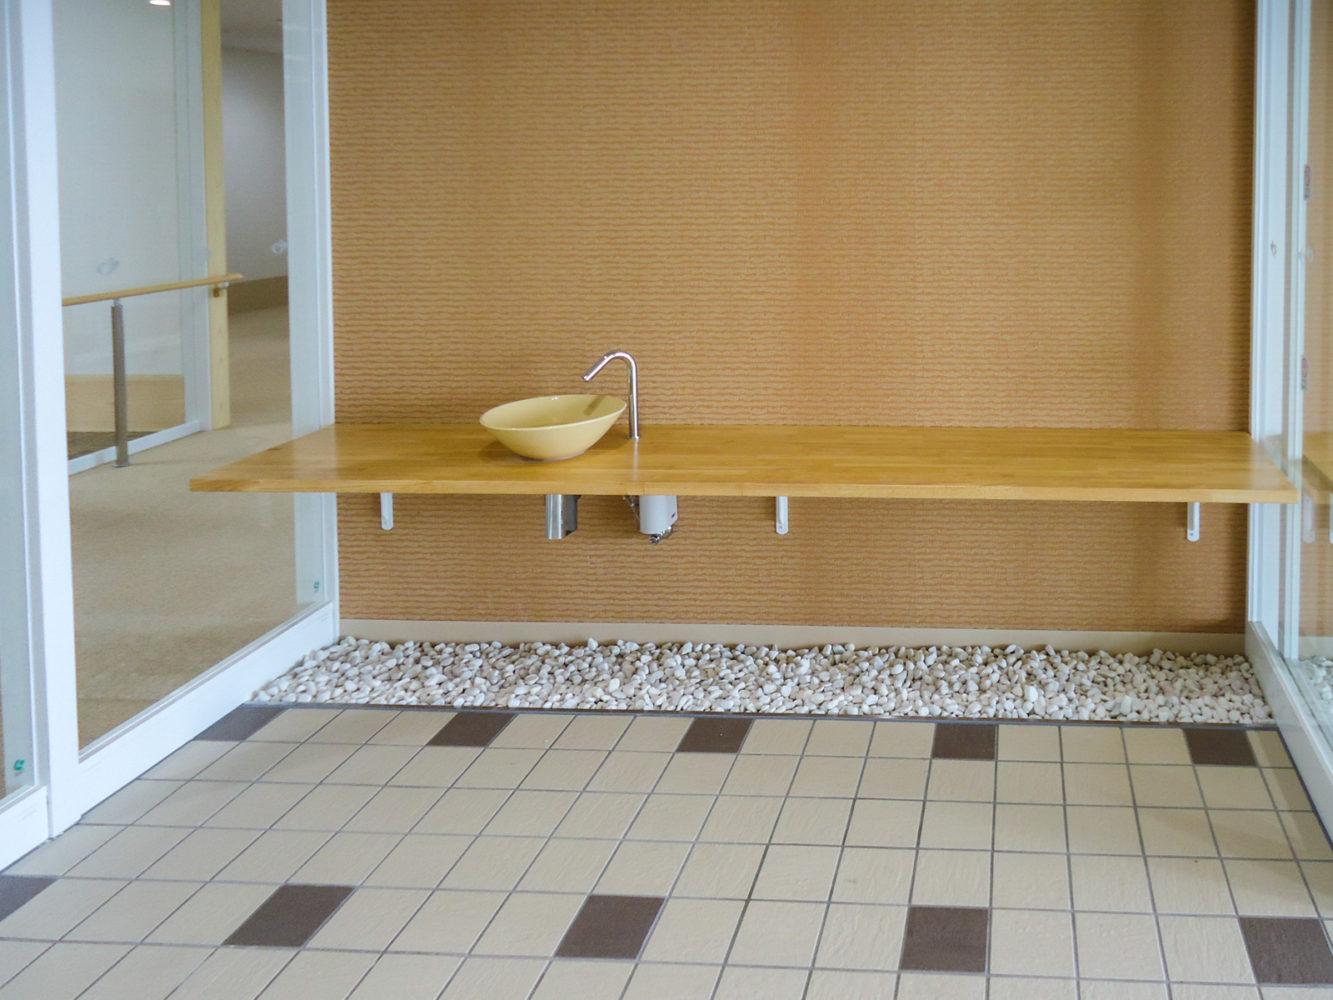 Special Nursing Home for the Elderly D